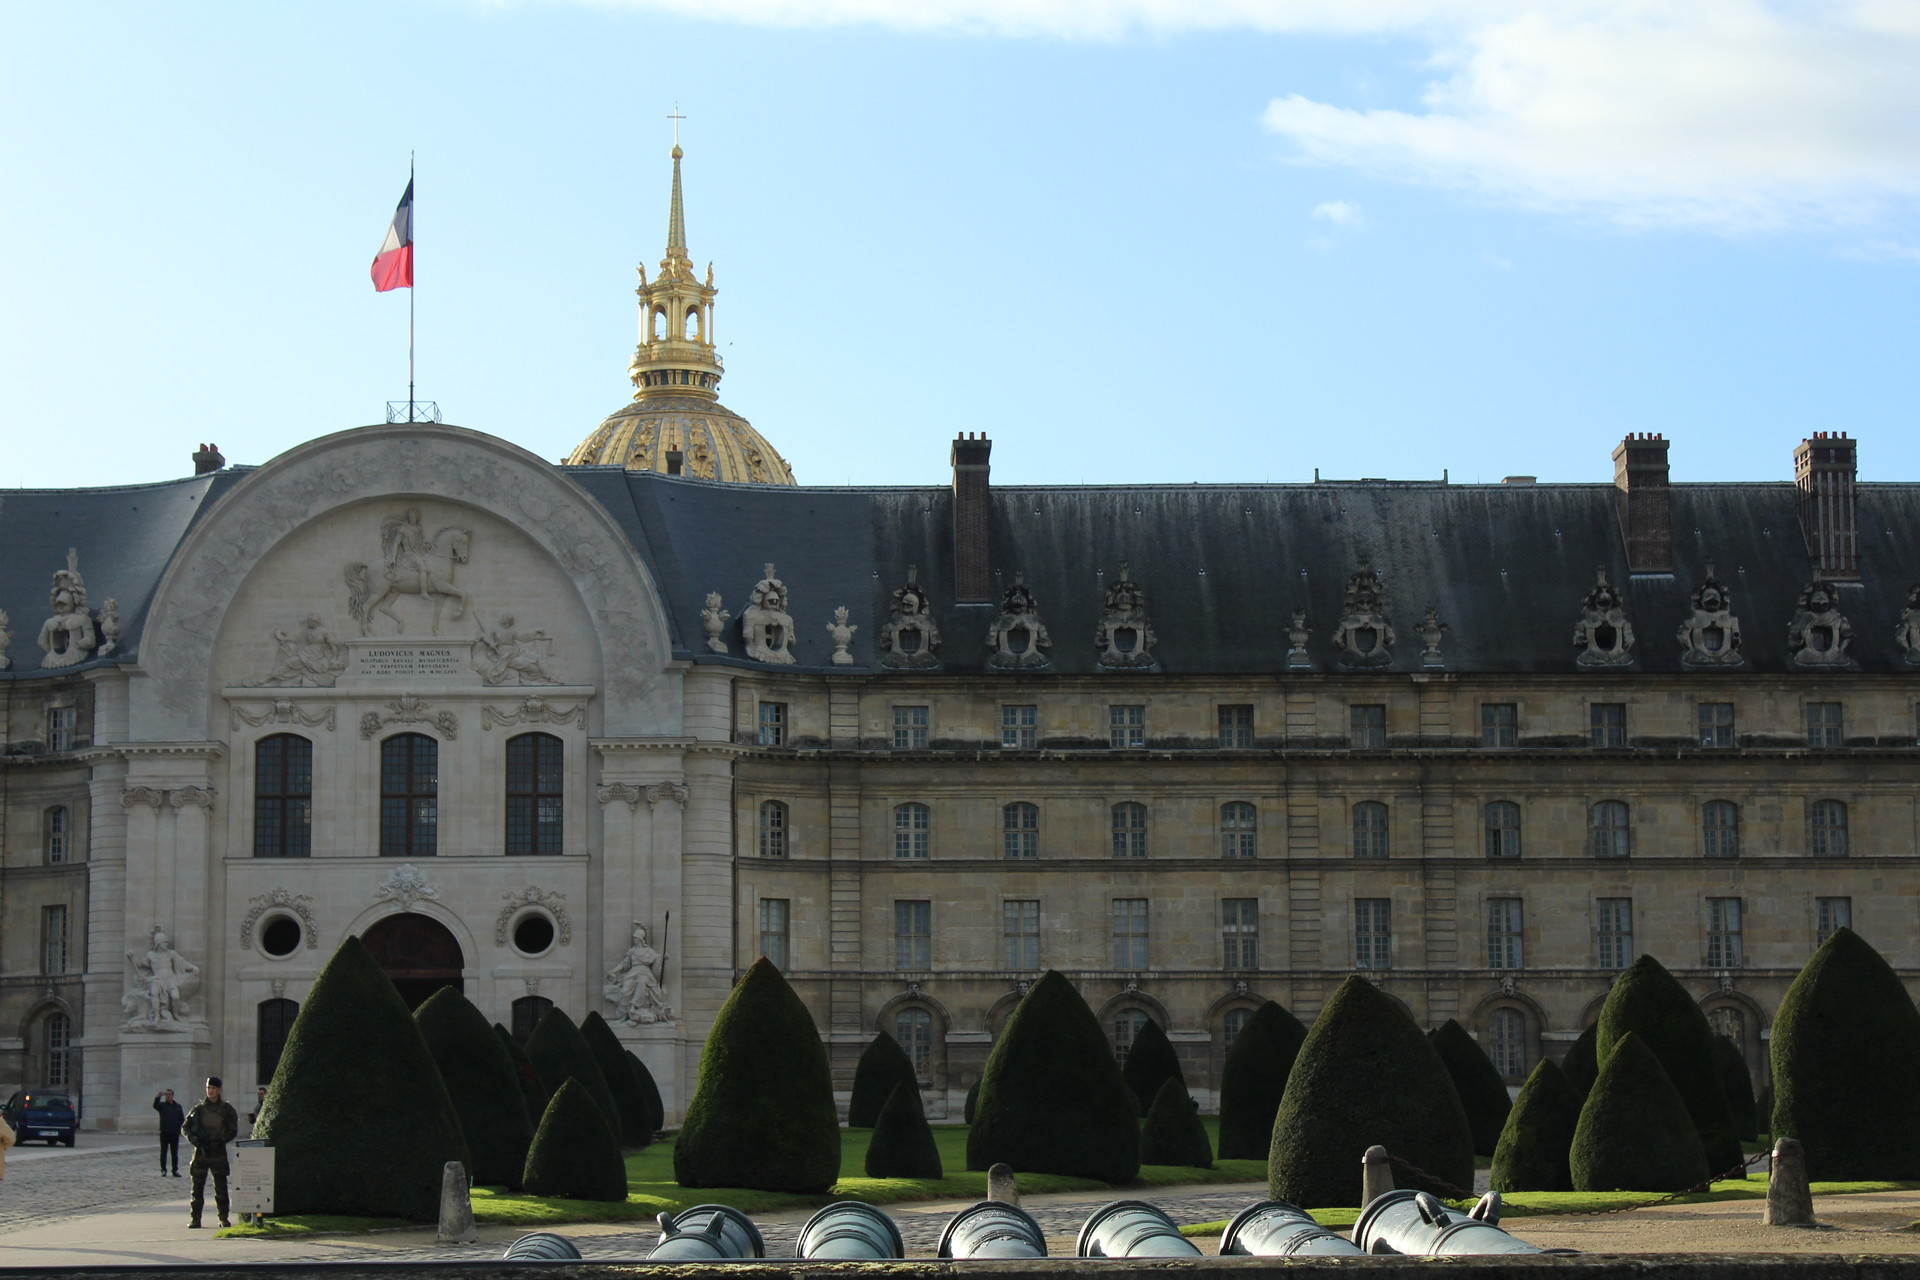 another-historic-place-paris-4f75642a809